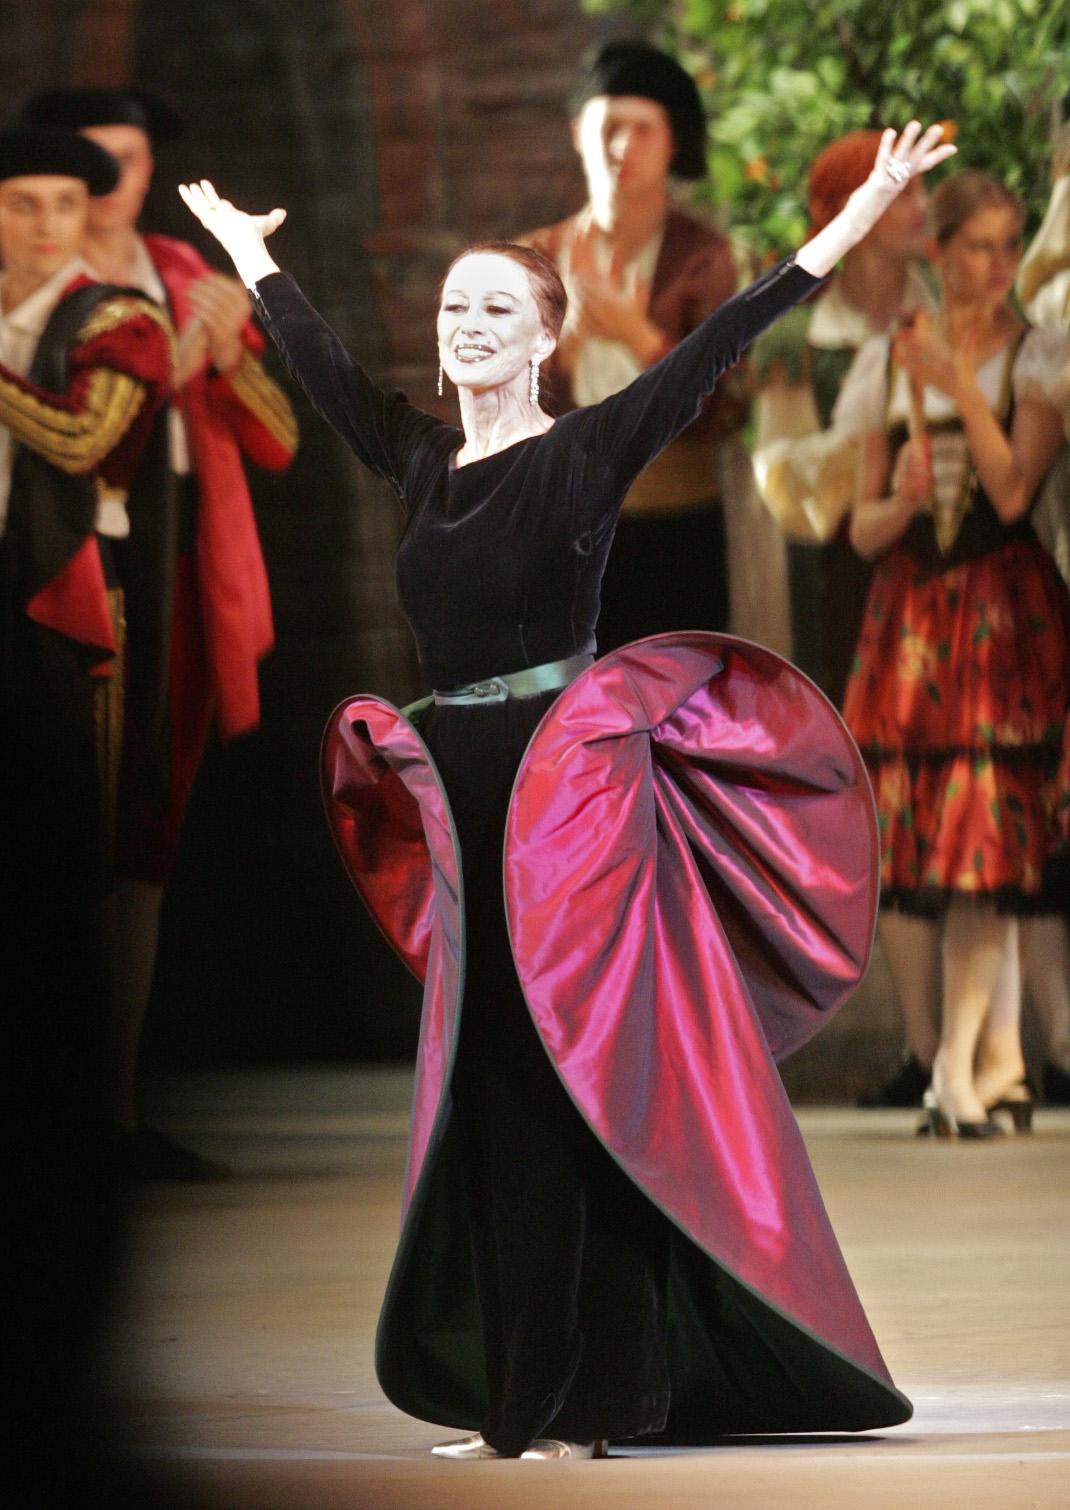 e19342121c6 Η Μάγια Πλισέτσκαγια ήταν η εμβληματική προσωποποίηση του μεγάλου μπαλέτου  και ταυτίστηκε με τα Μπολσόι όσο καμία άλλη χορεύτρια. Η ίδια έλεγε ότι, ...